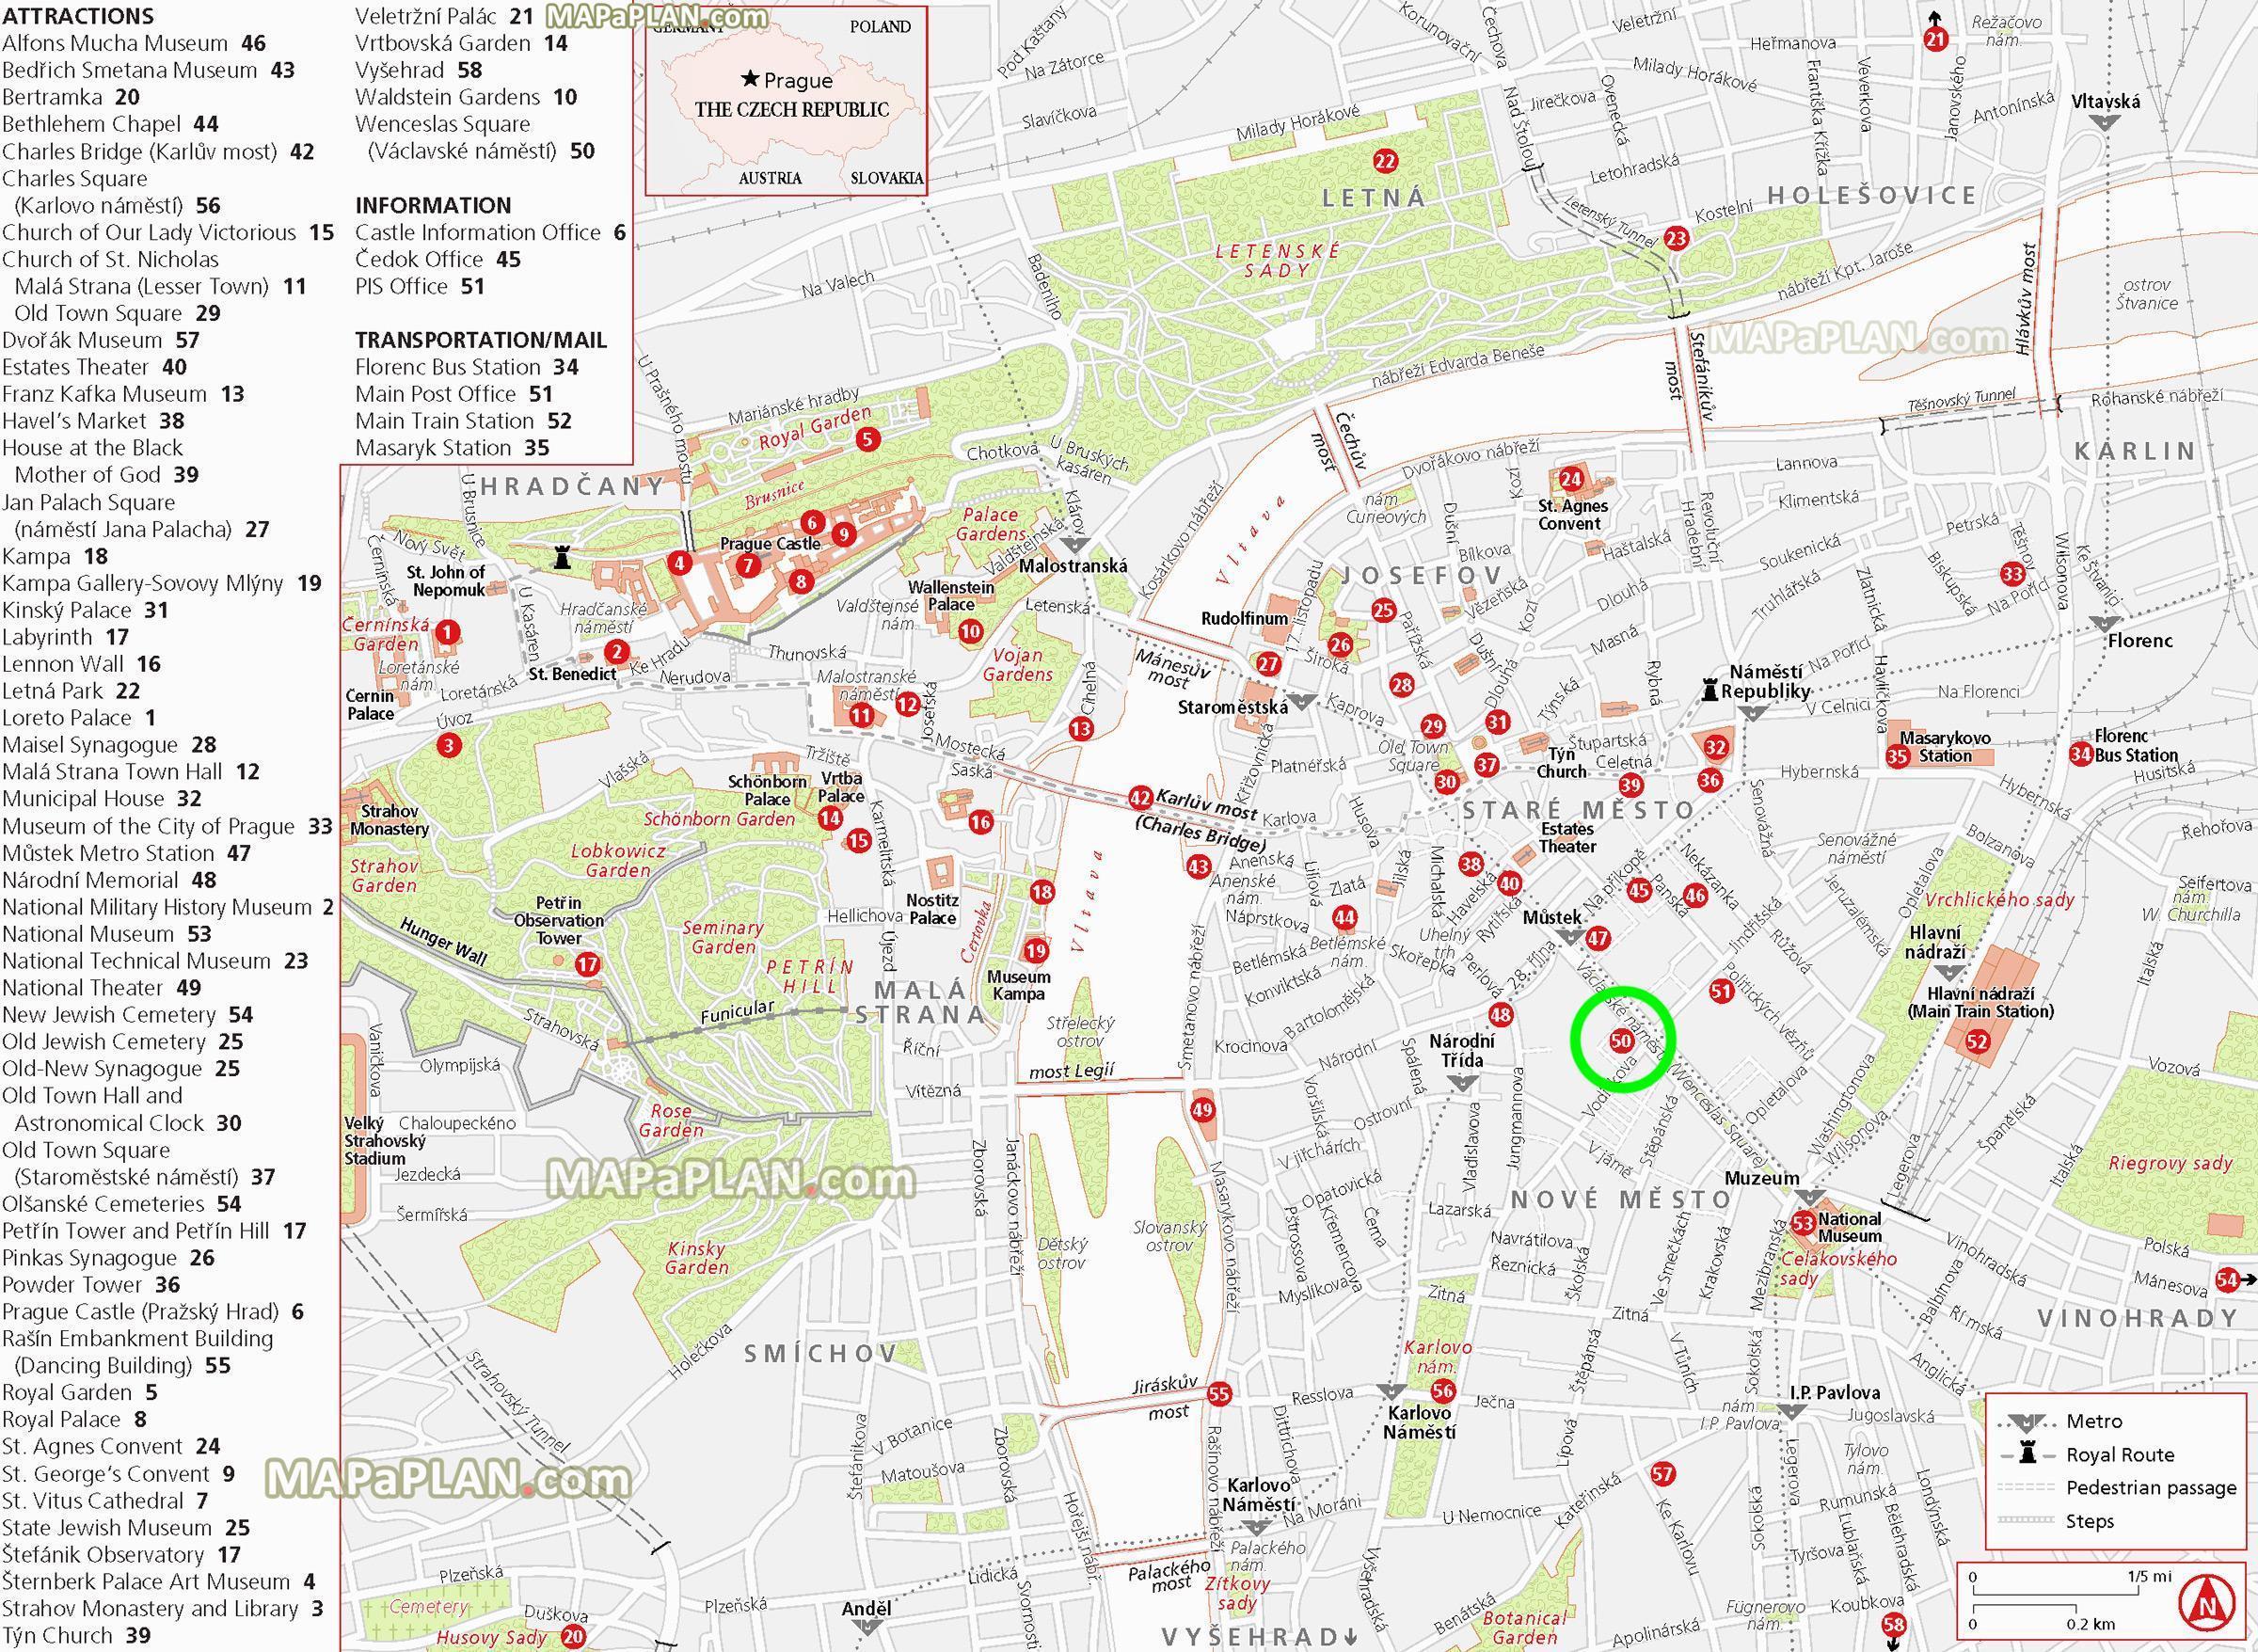 wenceslas square prague map Wenceslas Square Map Wenceslas Square Prague Map Bohemia Czechia wenceslas square prague map